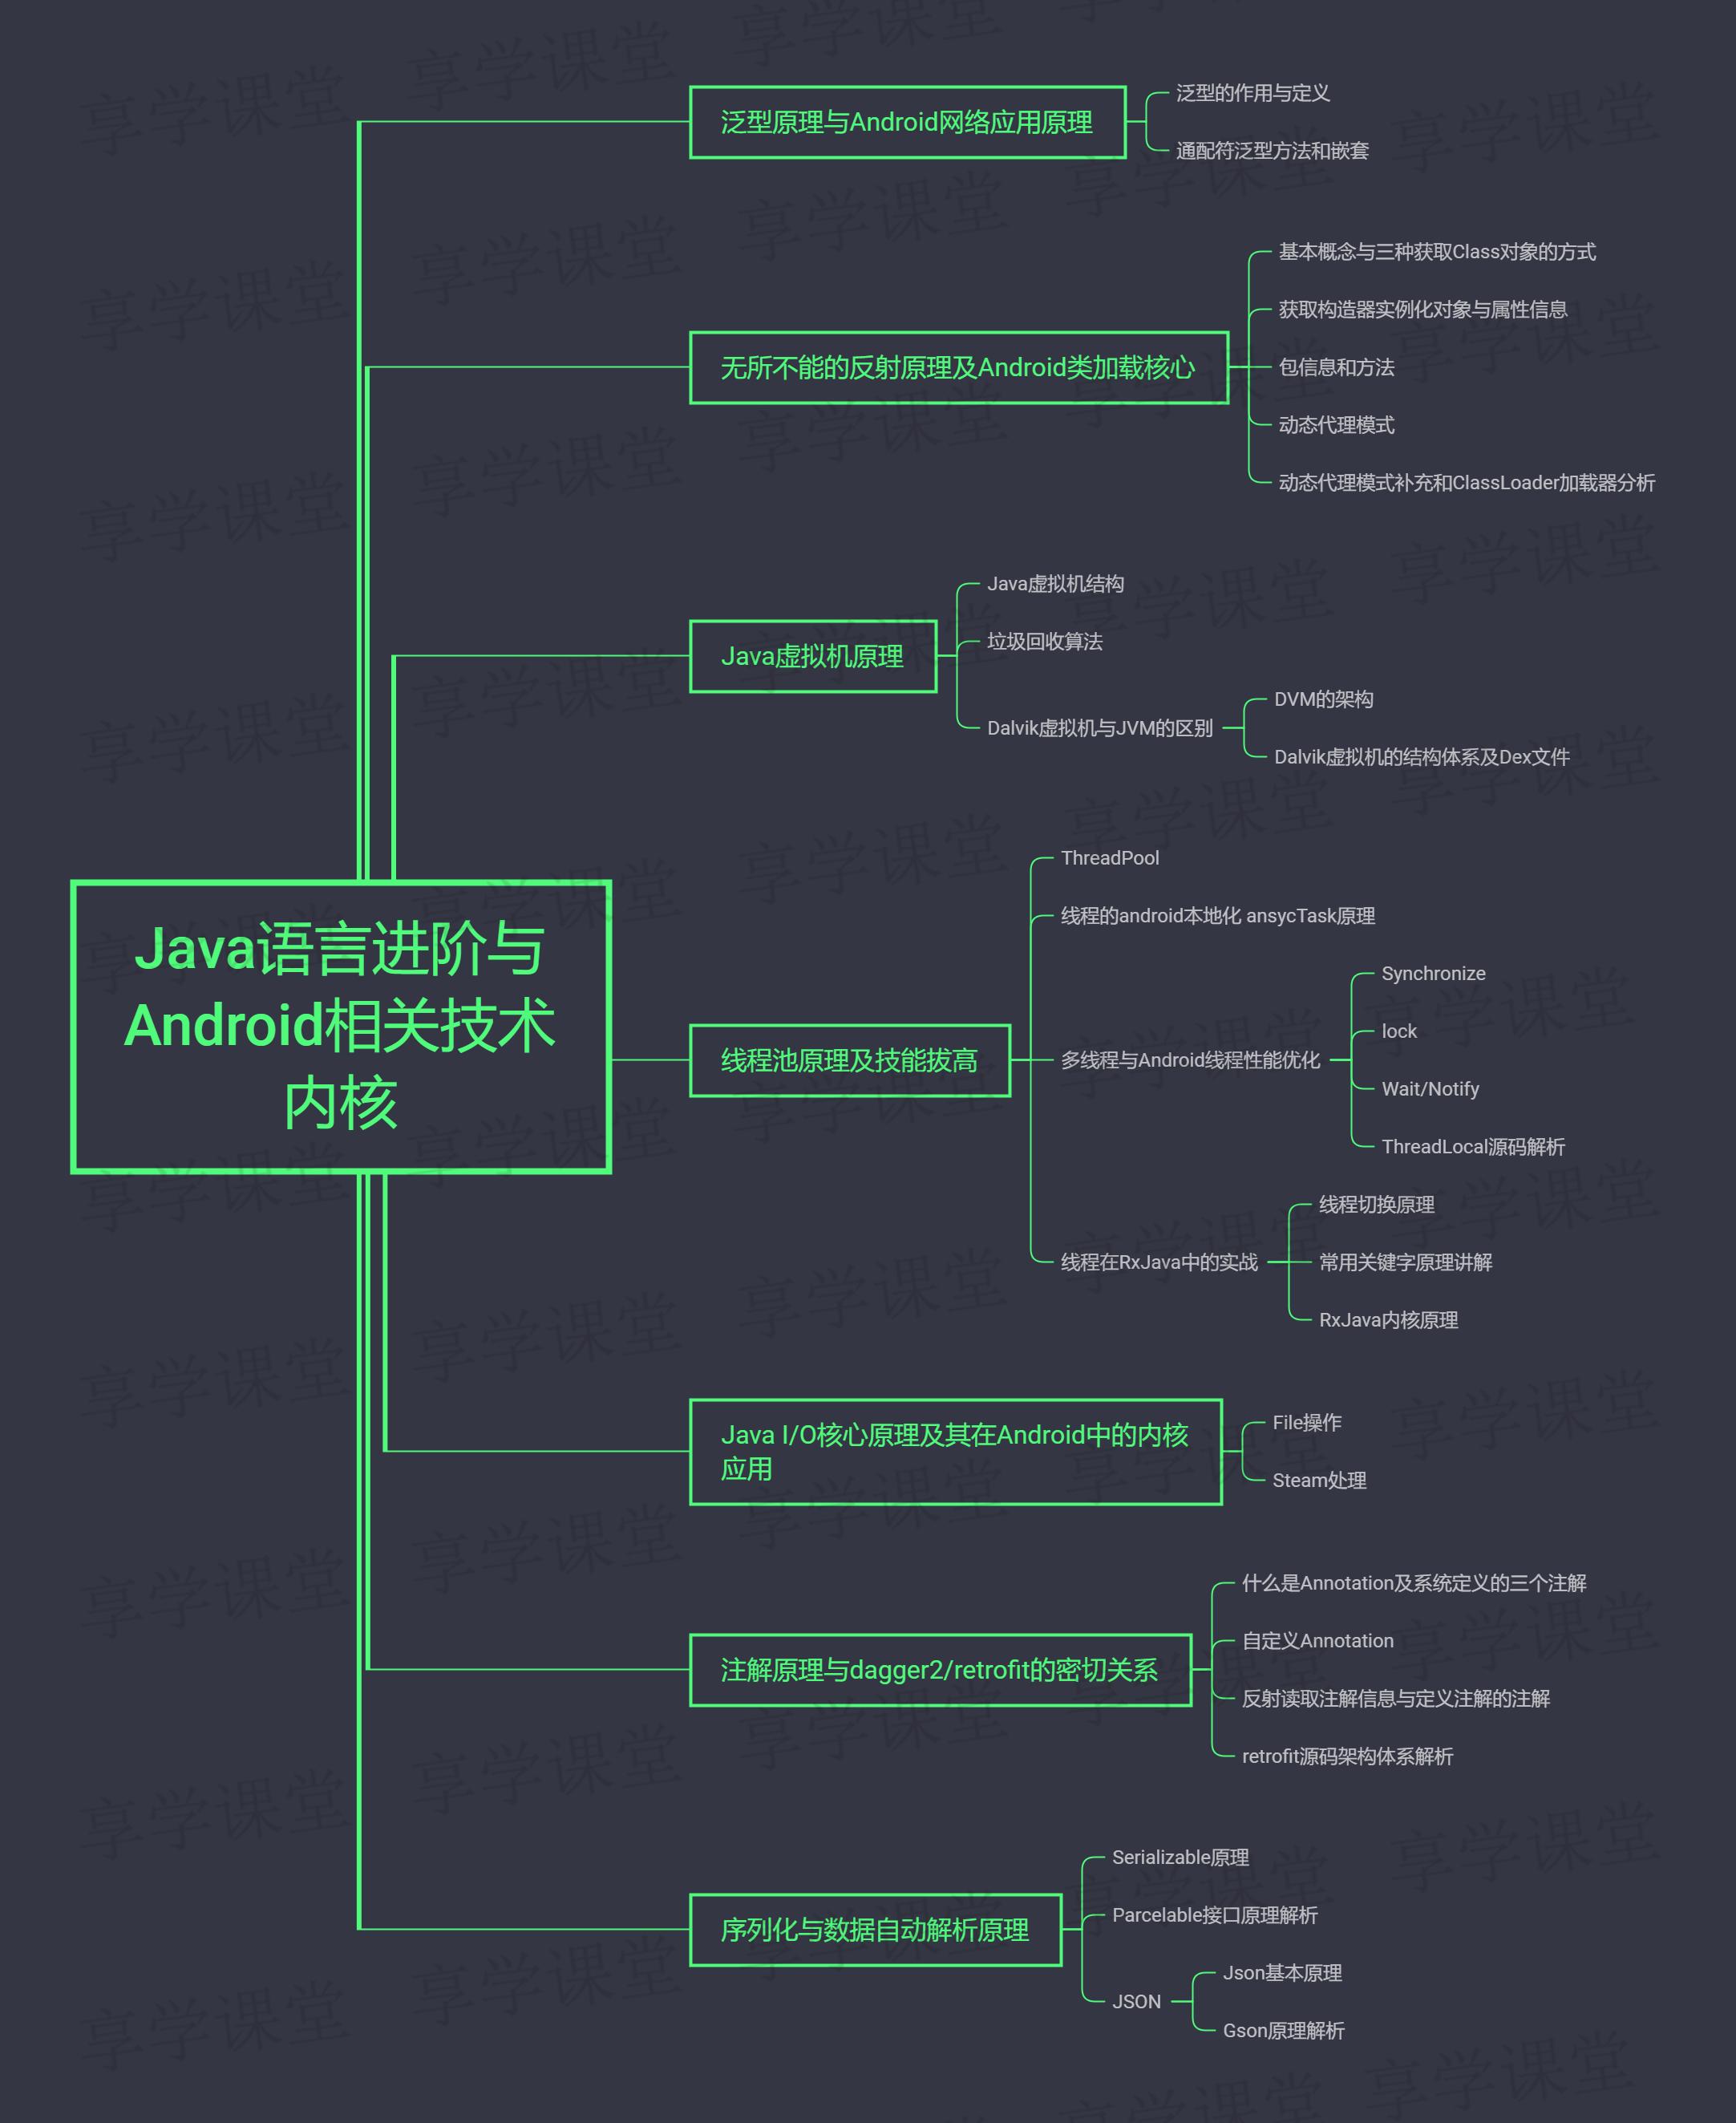 Java语言进阶与Android相关技术内核.png